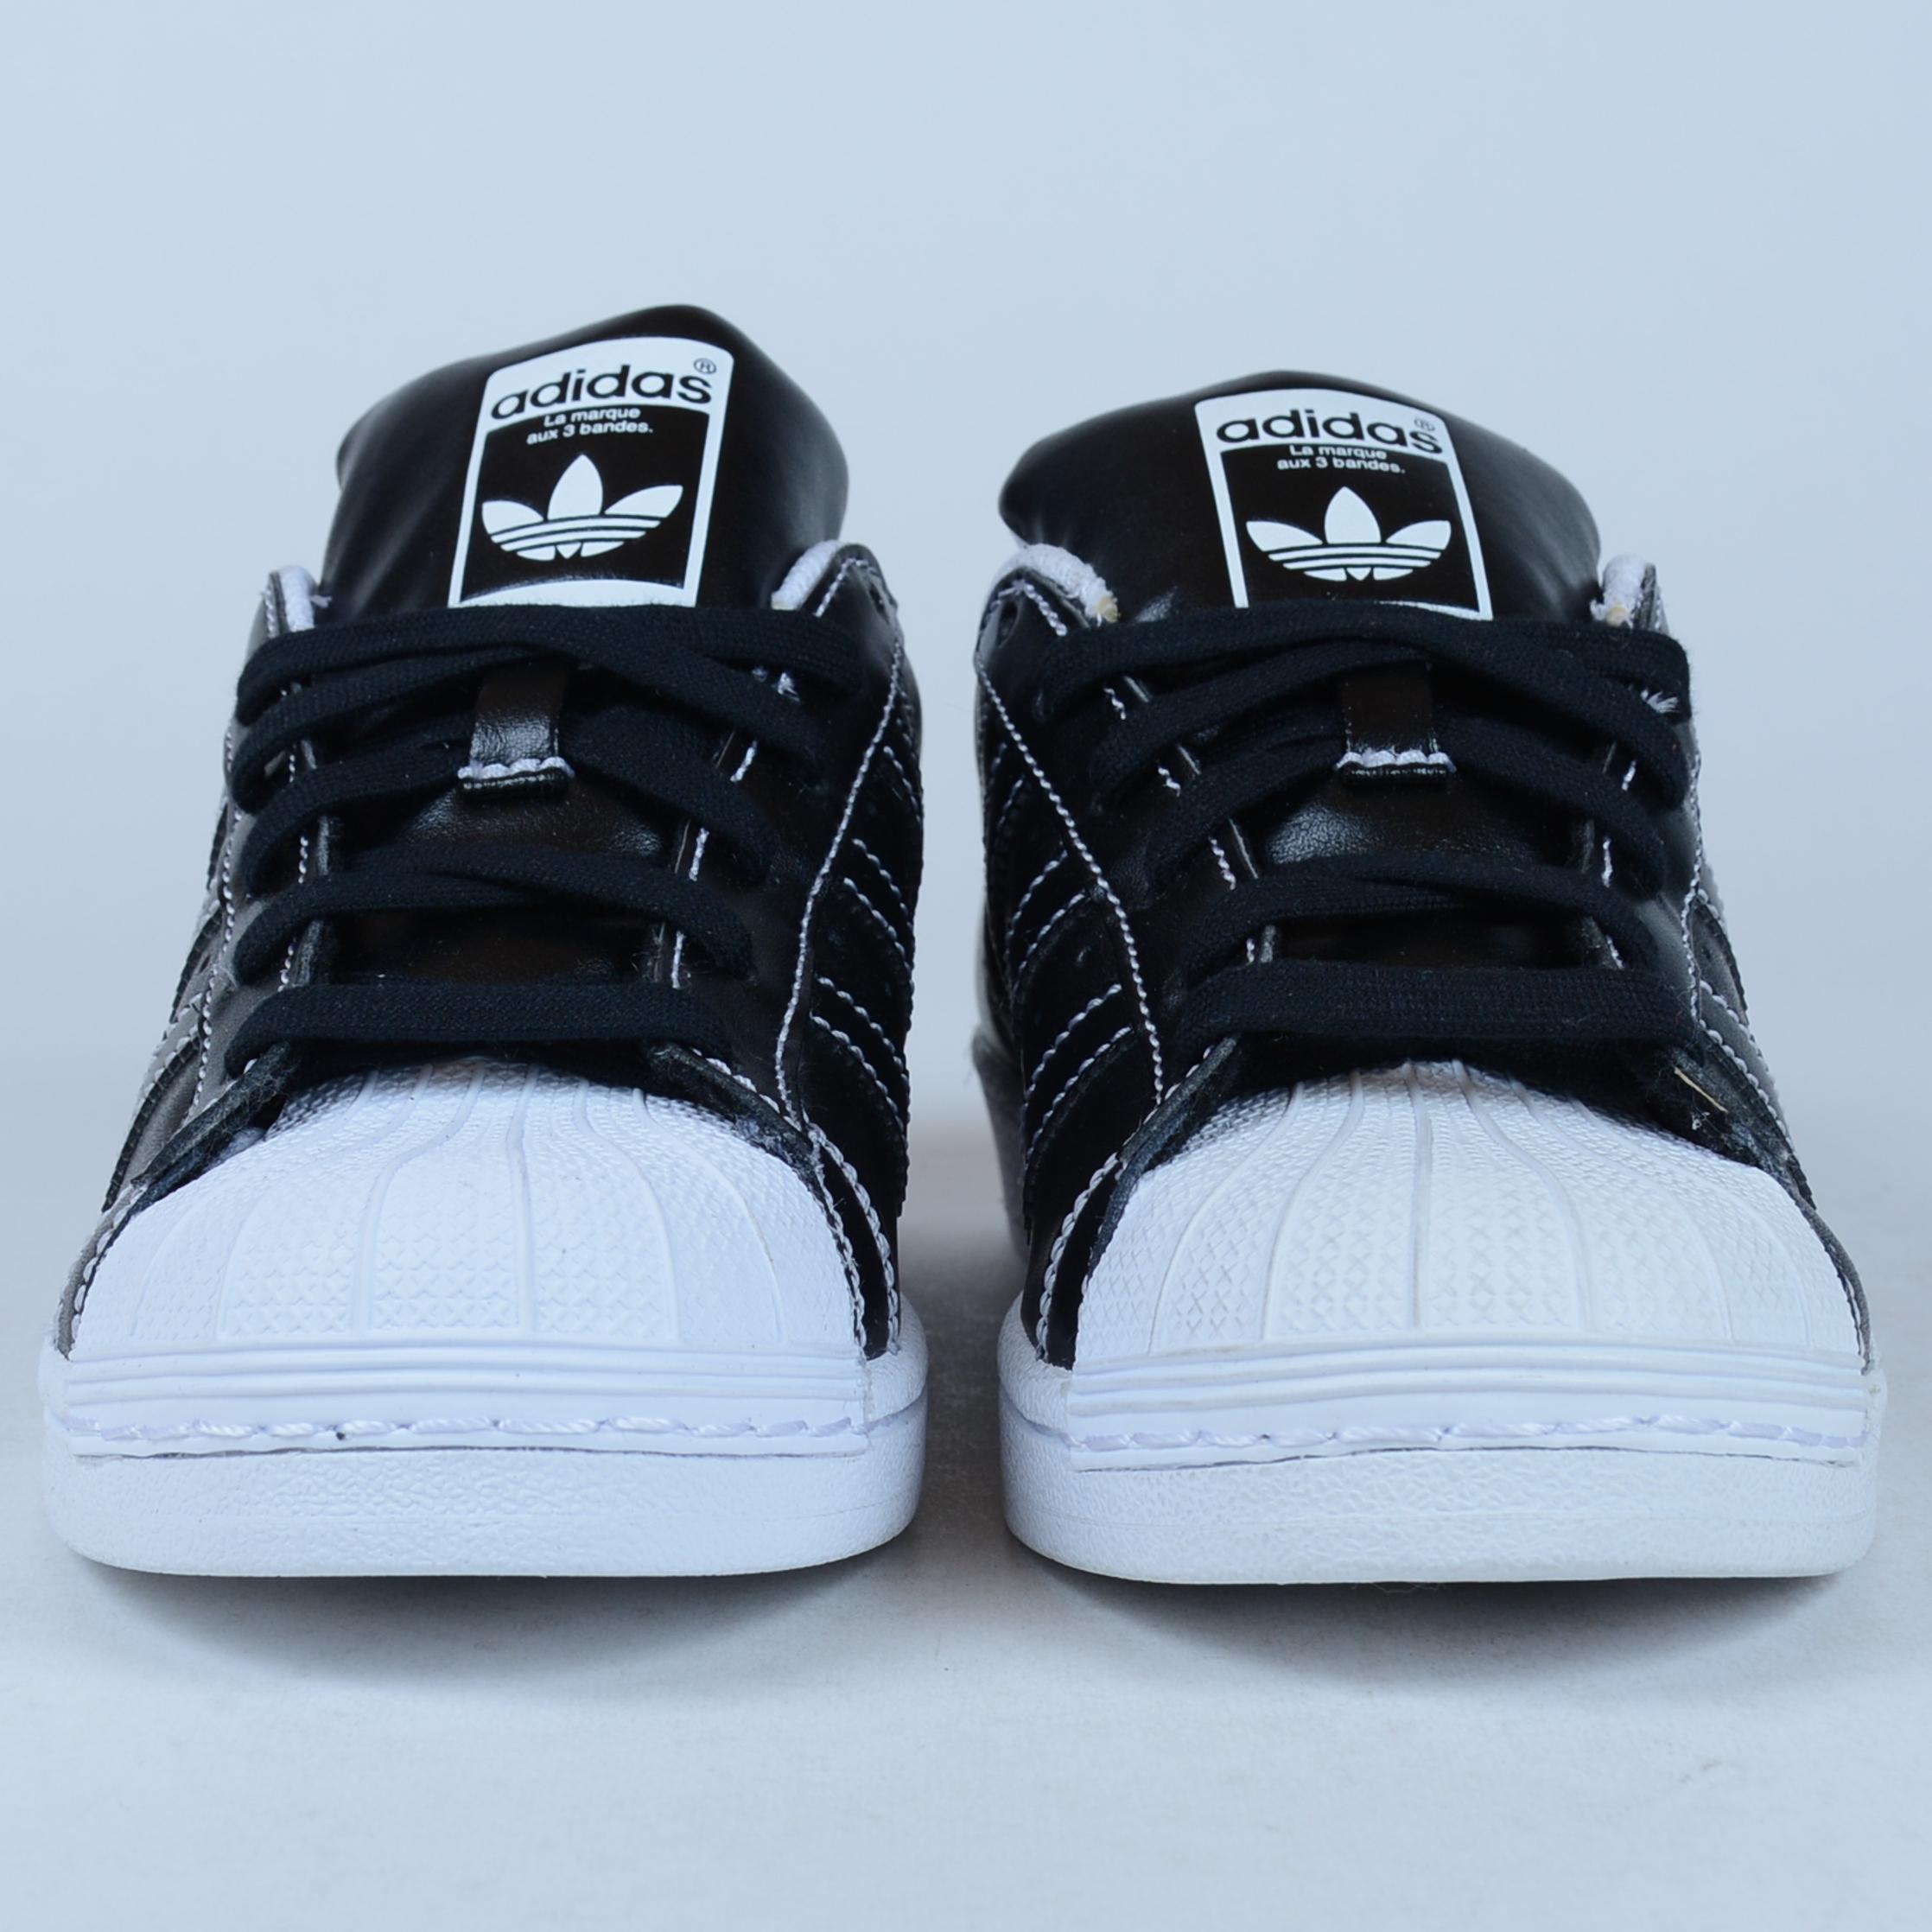 Adidas superstar gioventù 3 scarpe da ginnasticaale